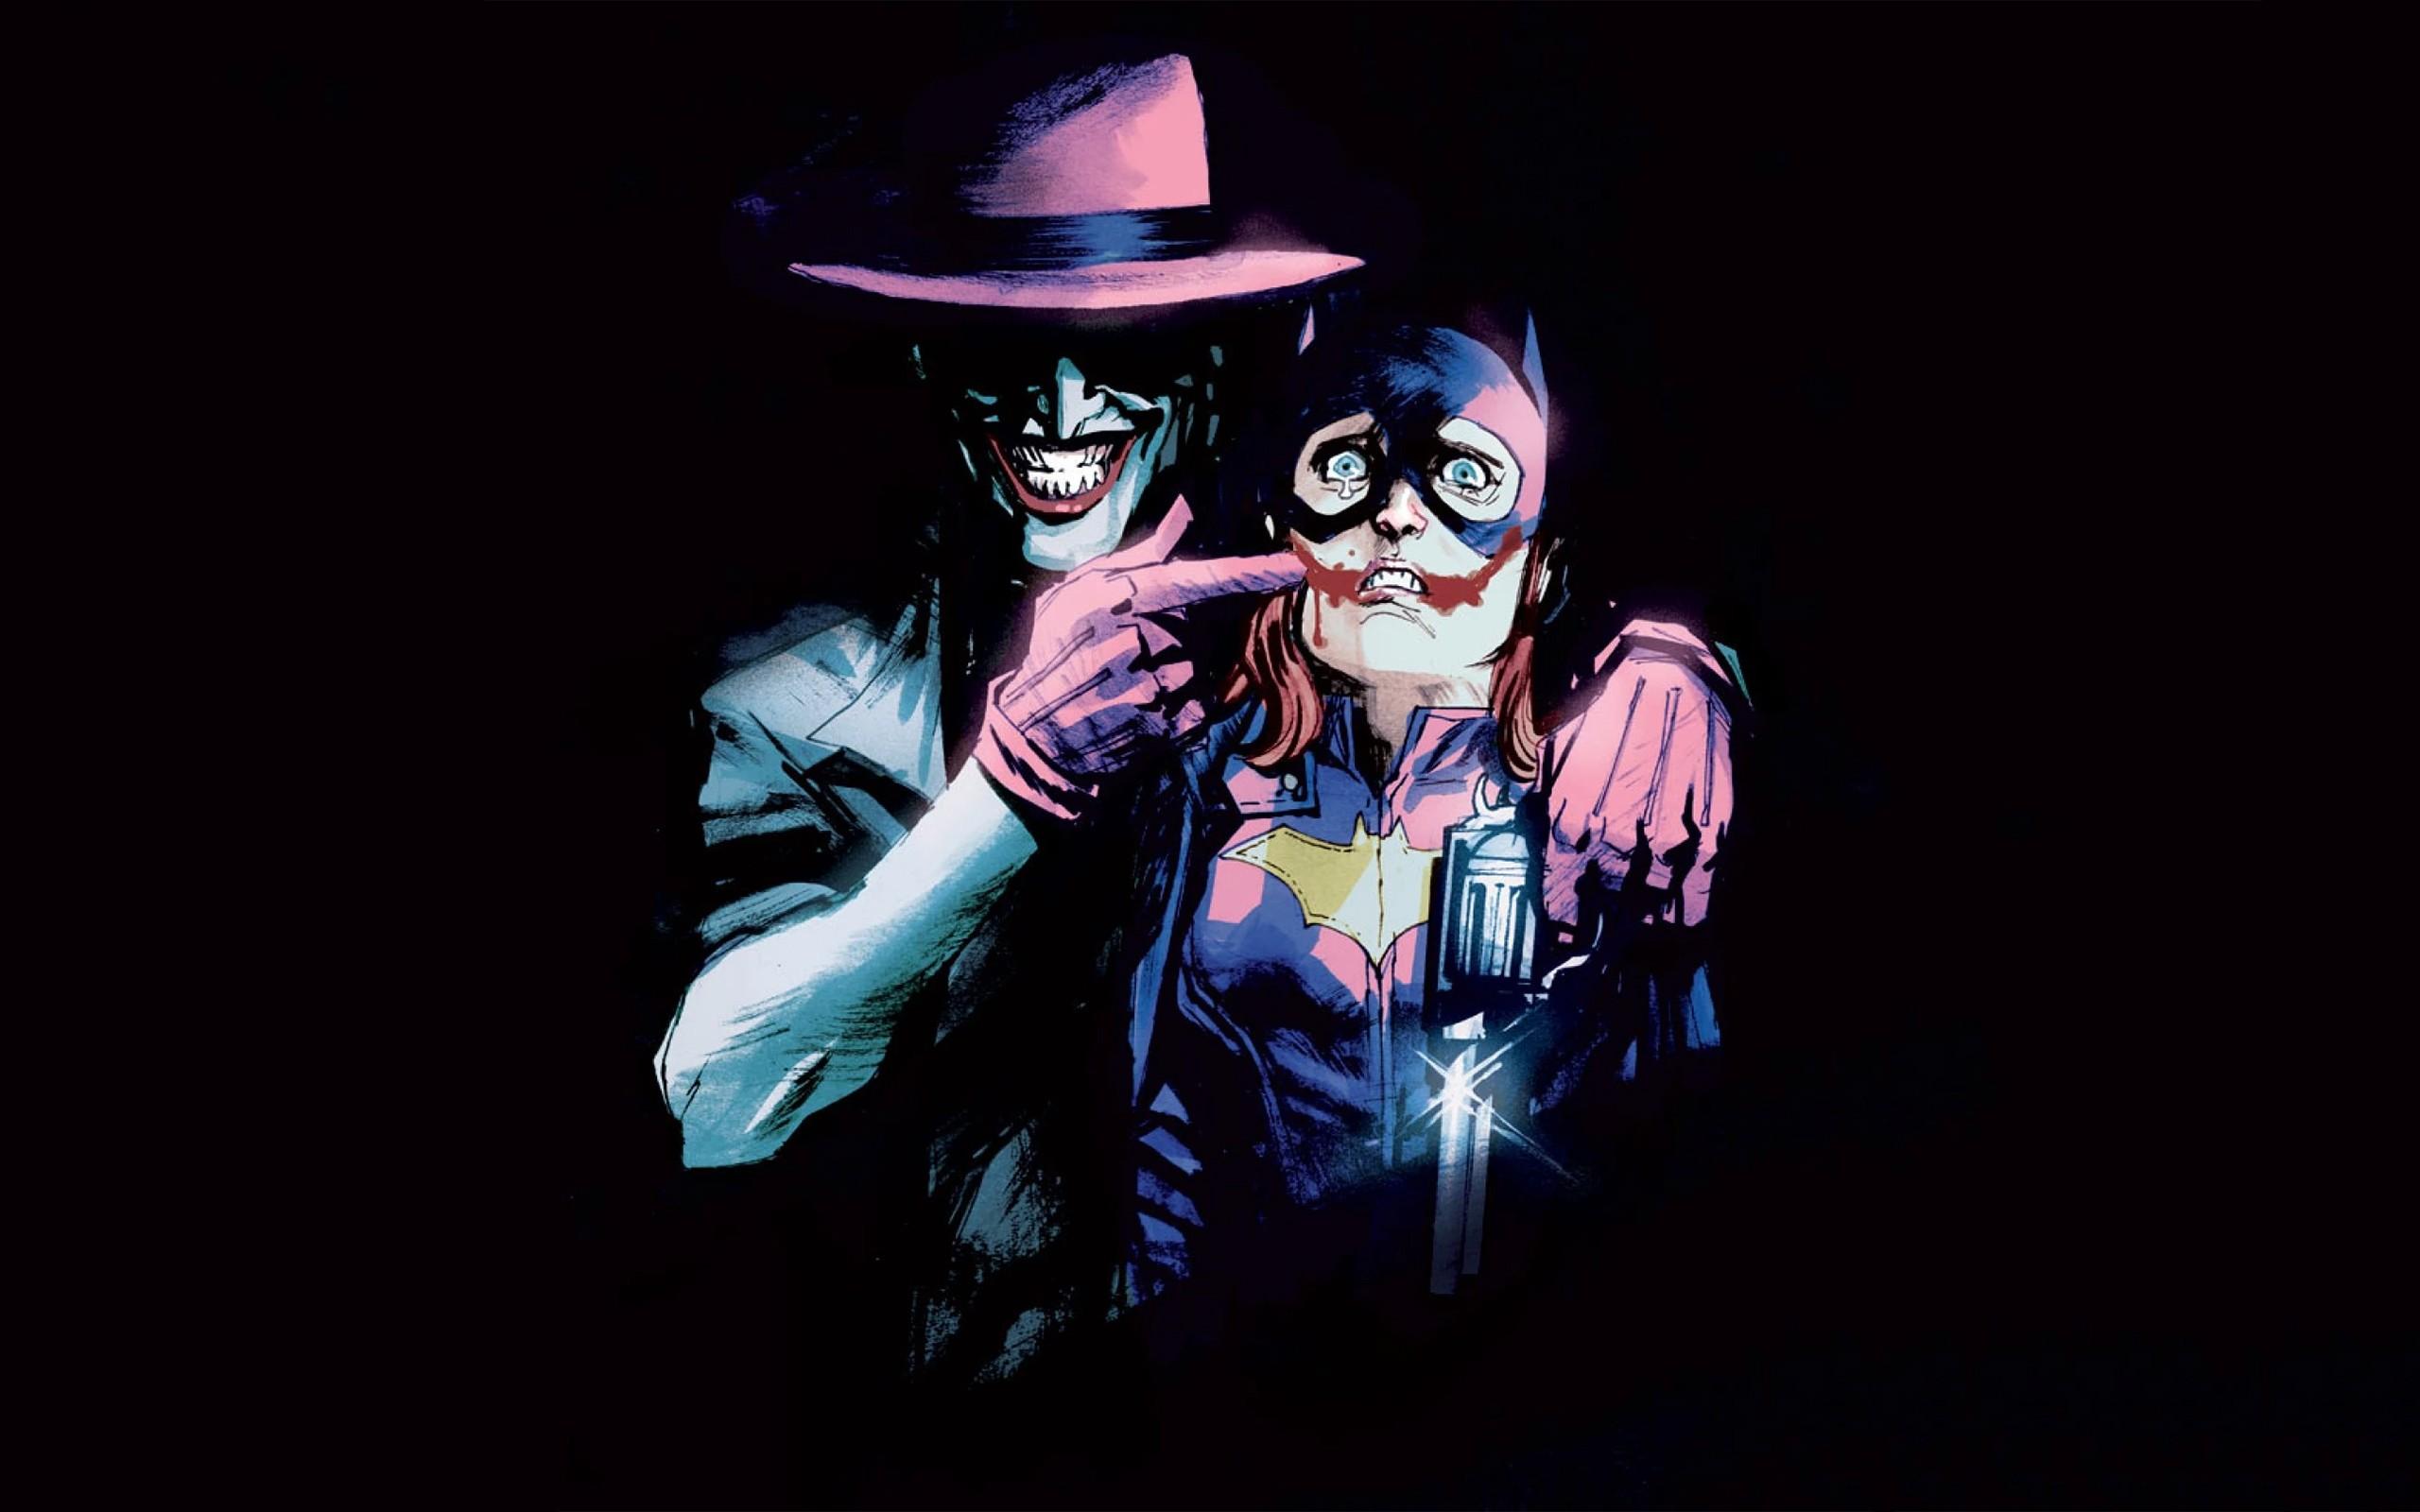 Illustration Joker DC Comics Batgirl Darkness Computer Wallpaper Musical Theatre Performing Arts